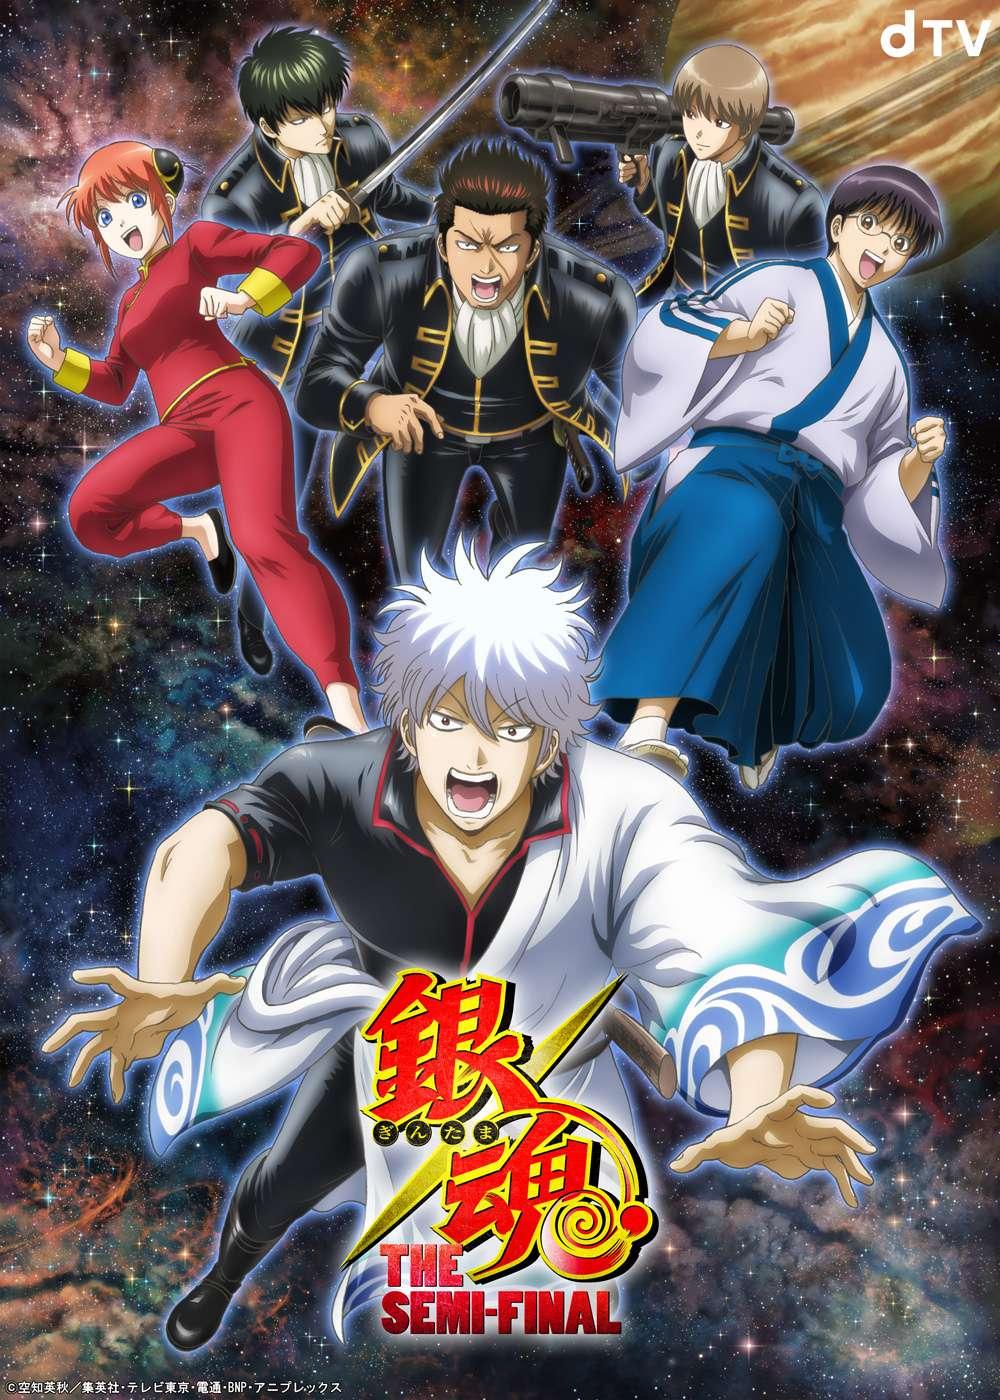 Gintama: The Semi-Final kapak